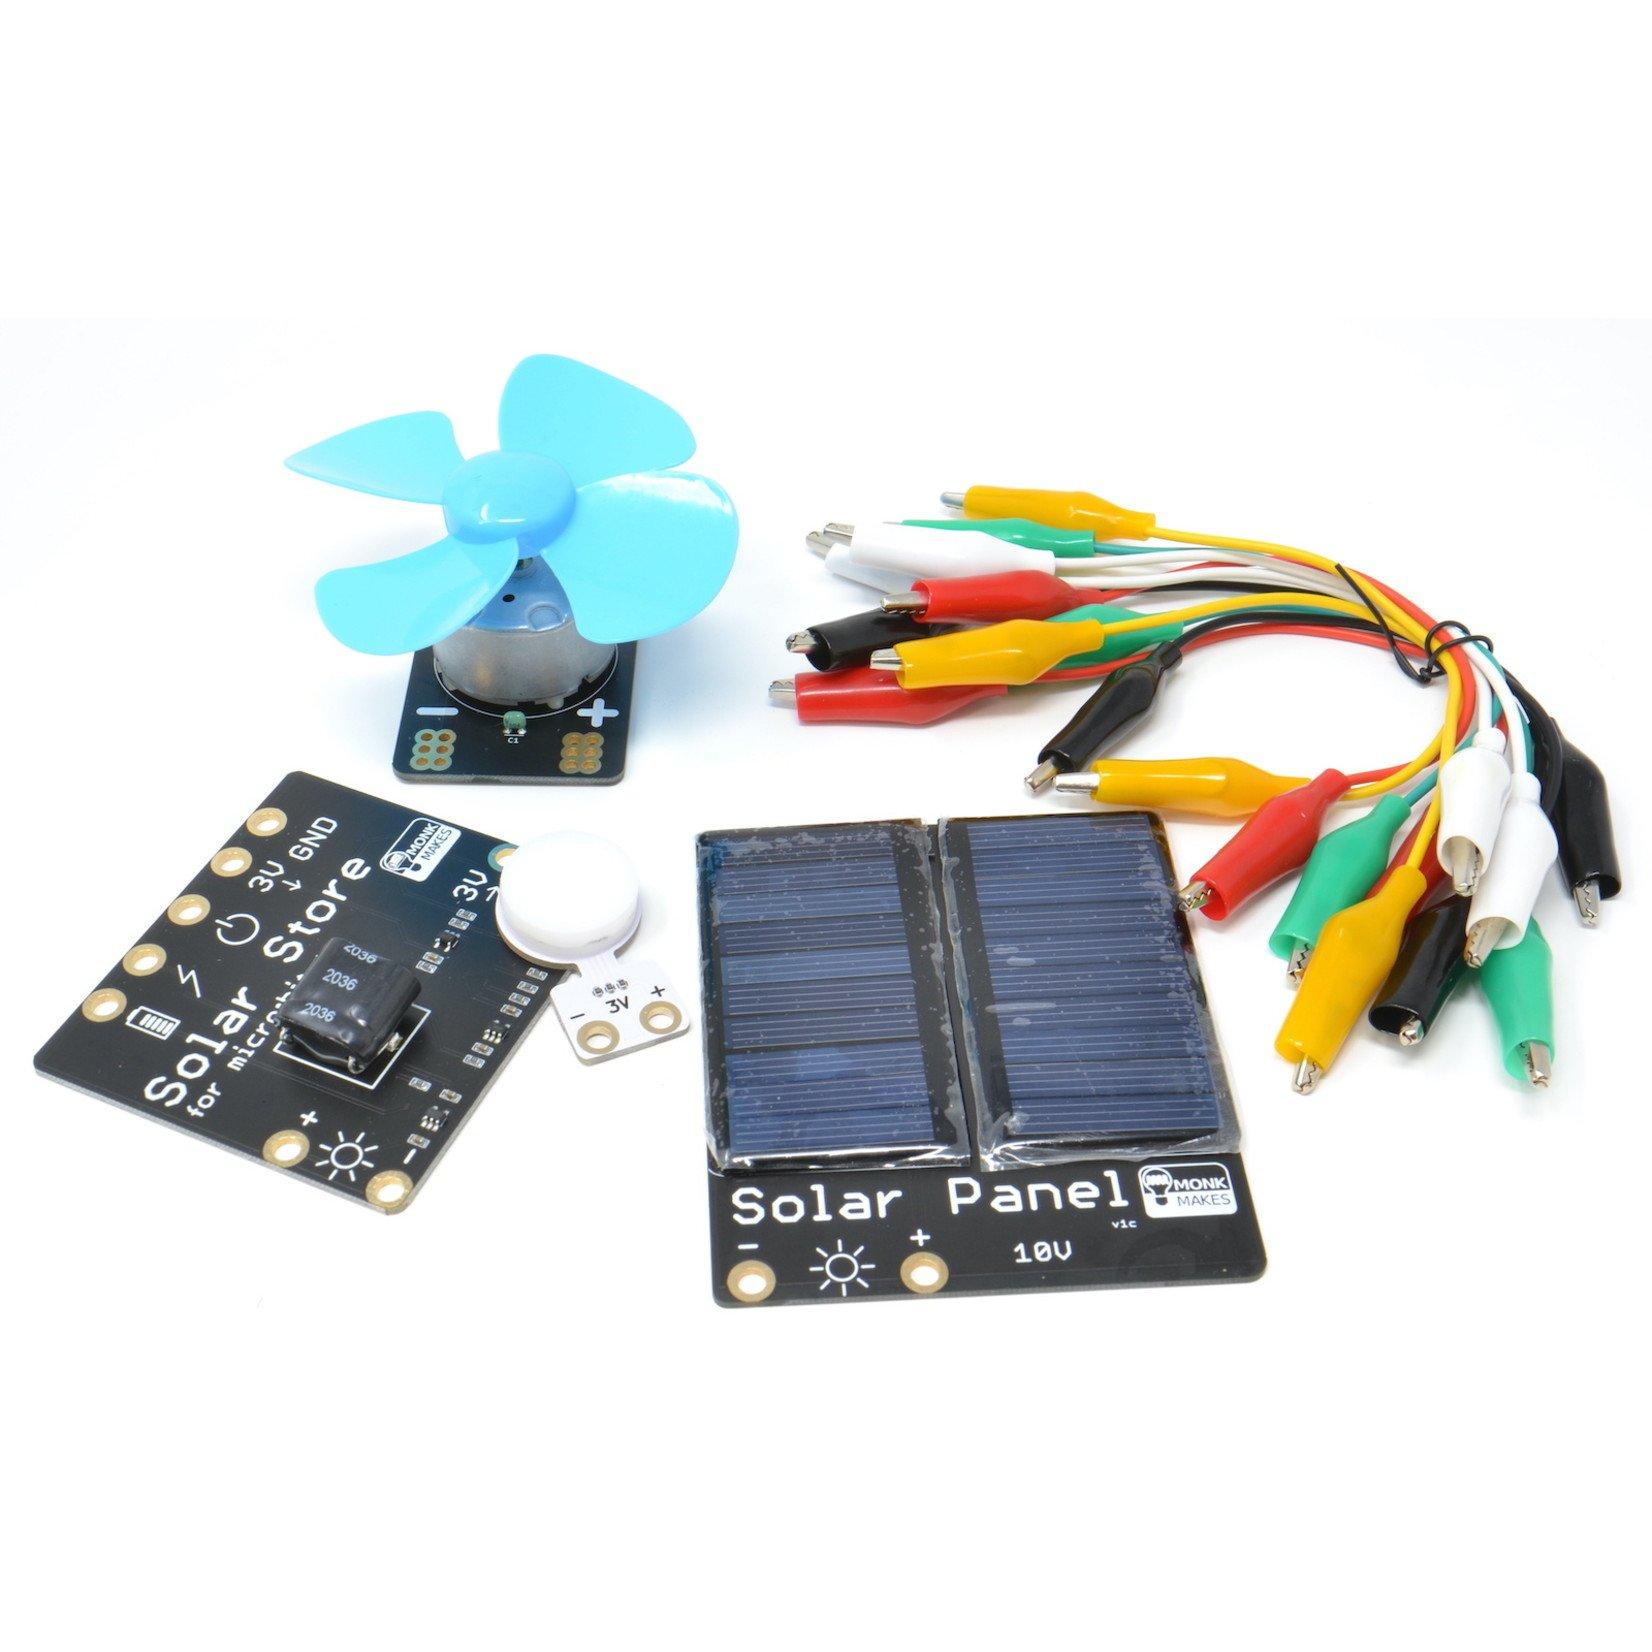 MonkMakes Solar Experimenters Kit for micro:bit